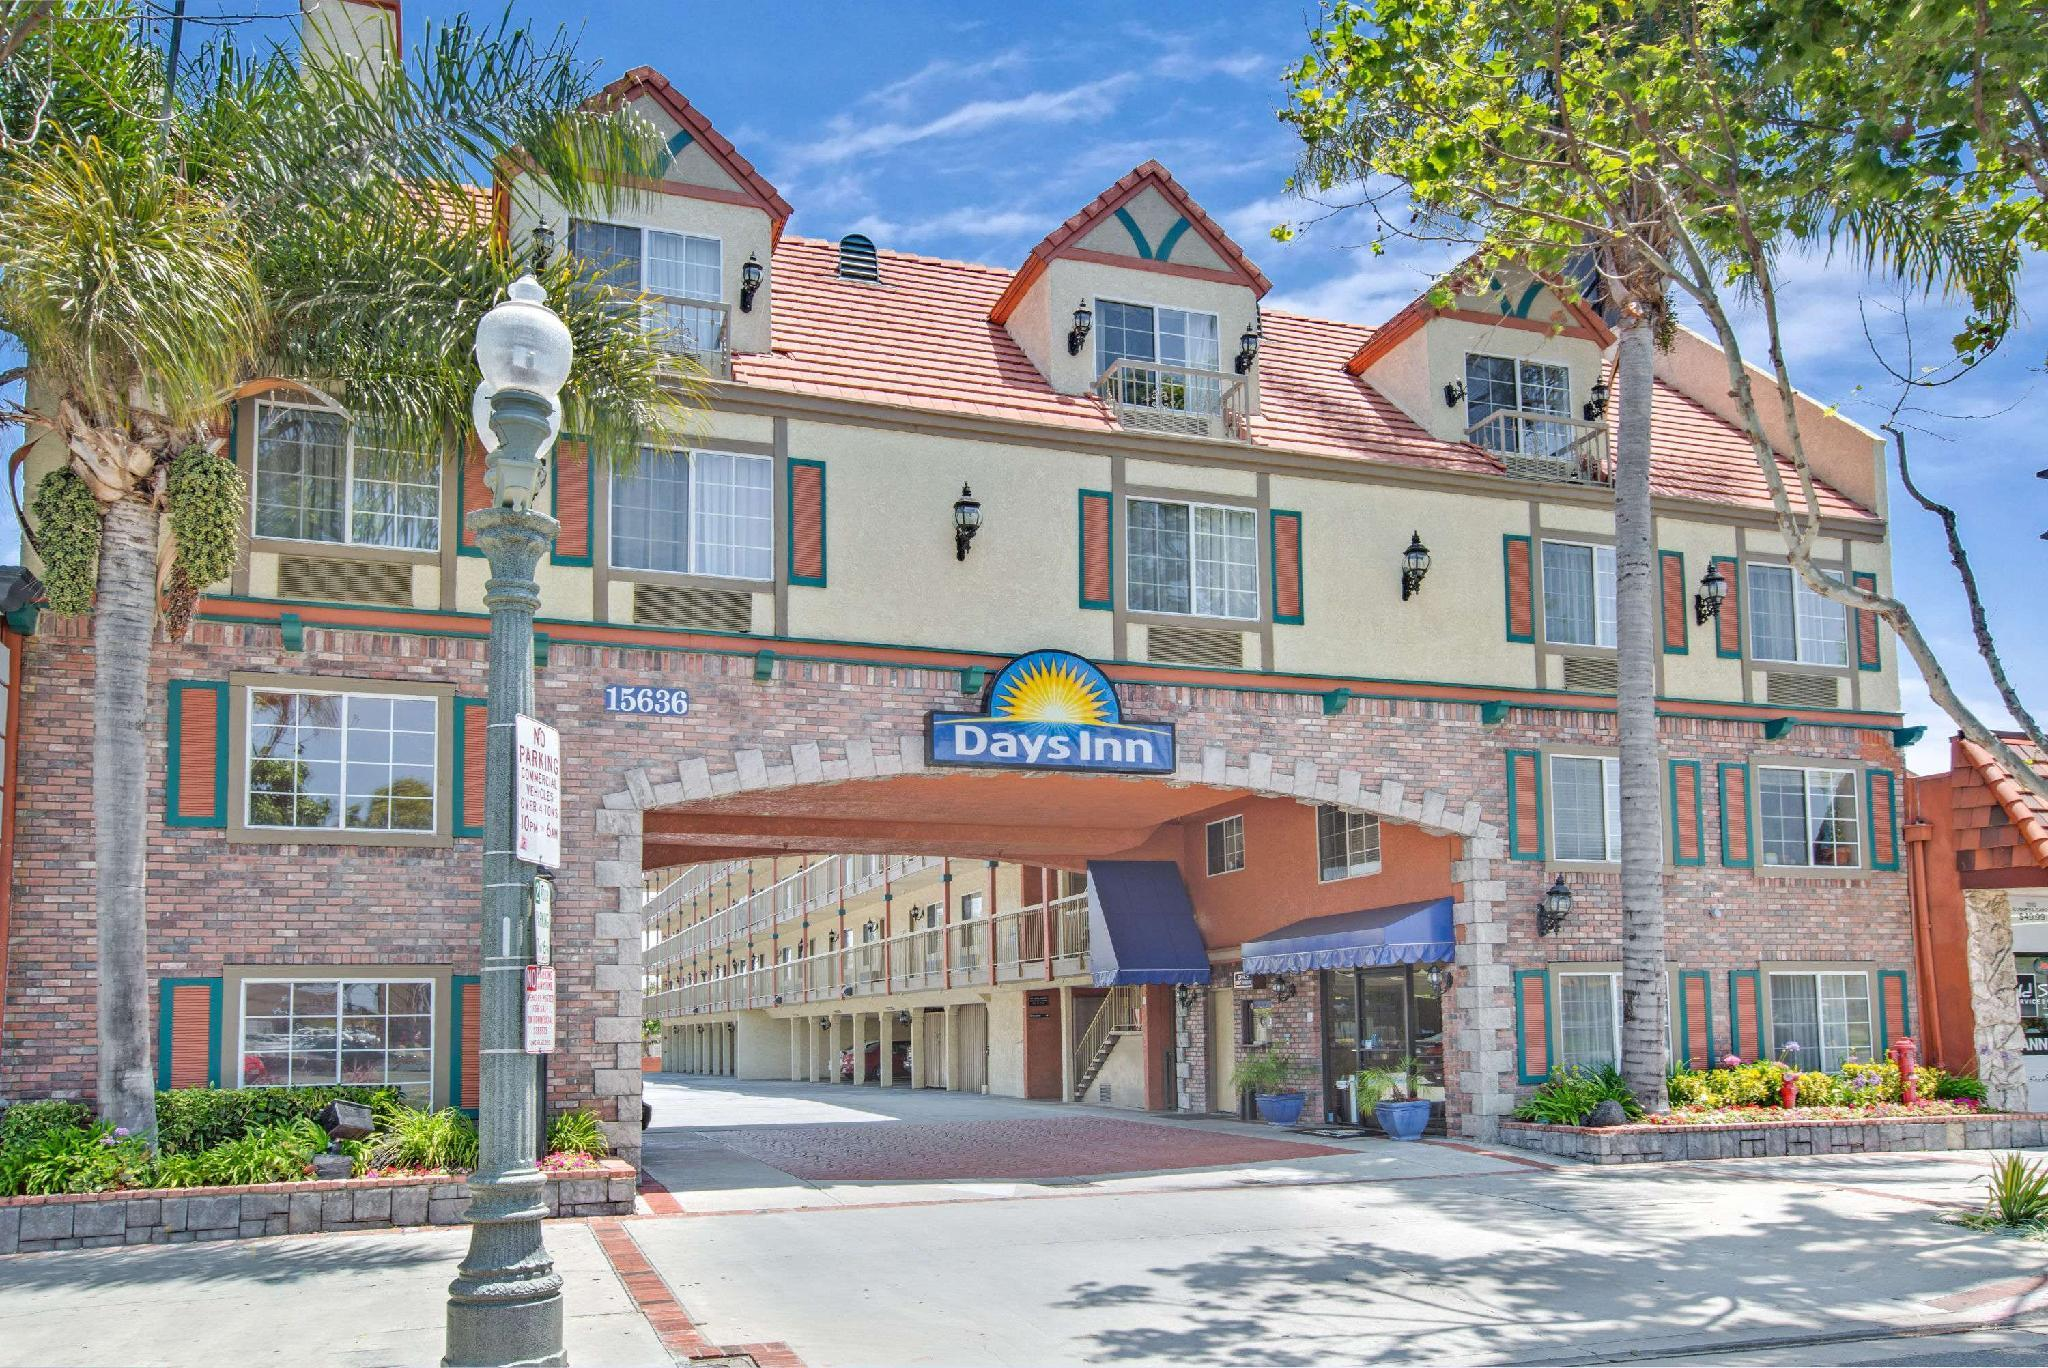 Days Inn By Wyndham Los Angeles LAX  RedondoandManhattanBeach